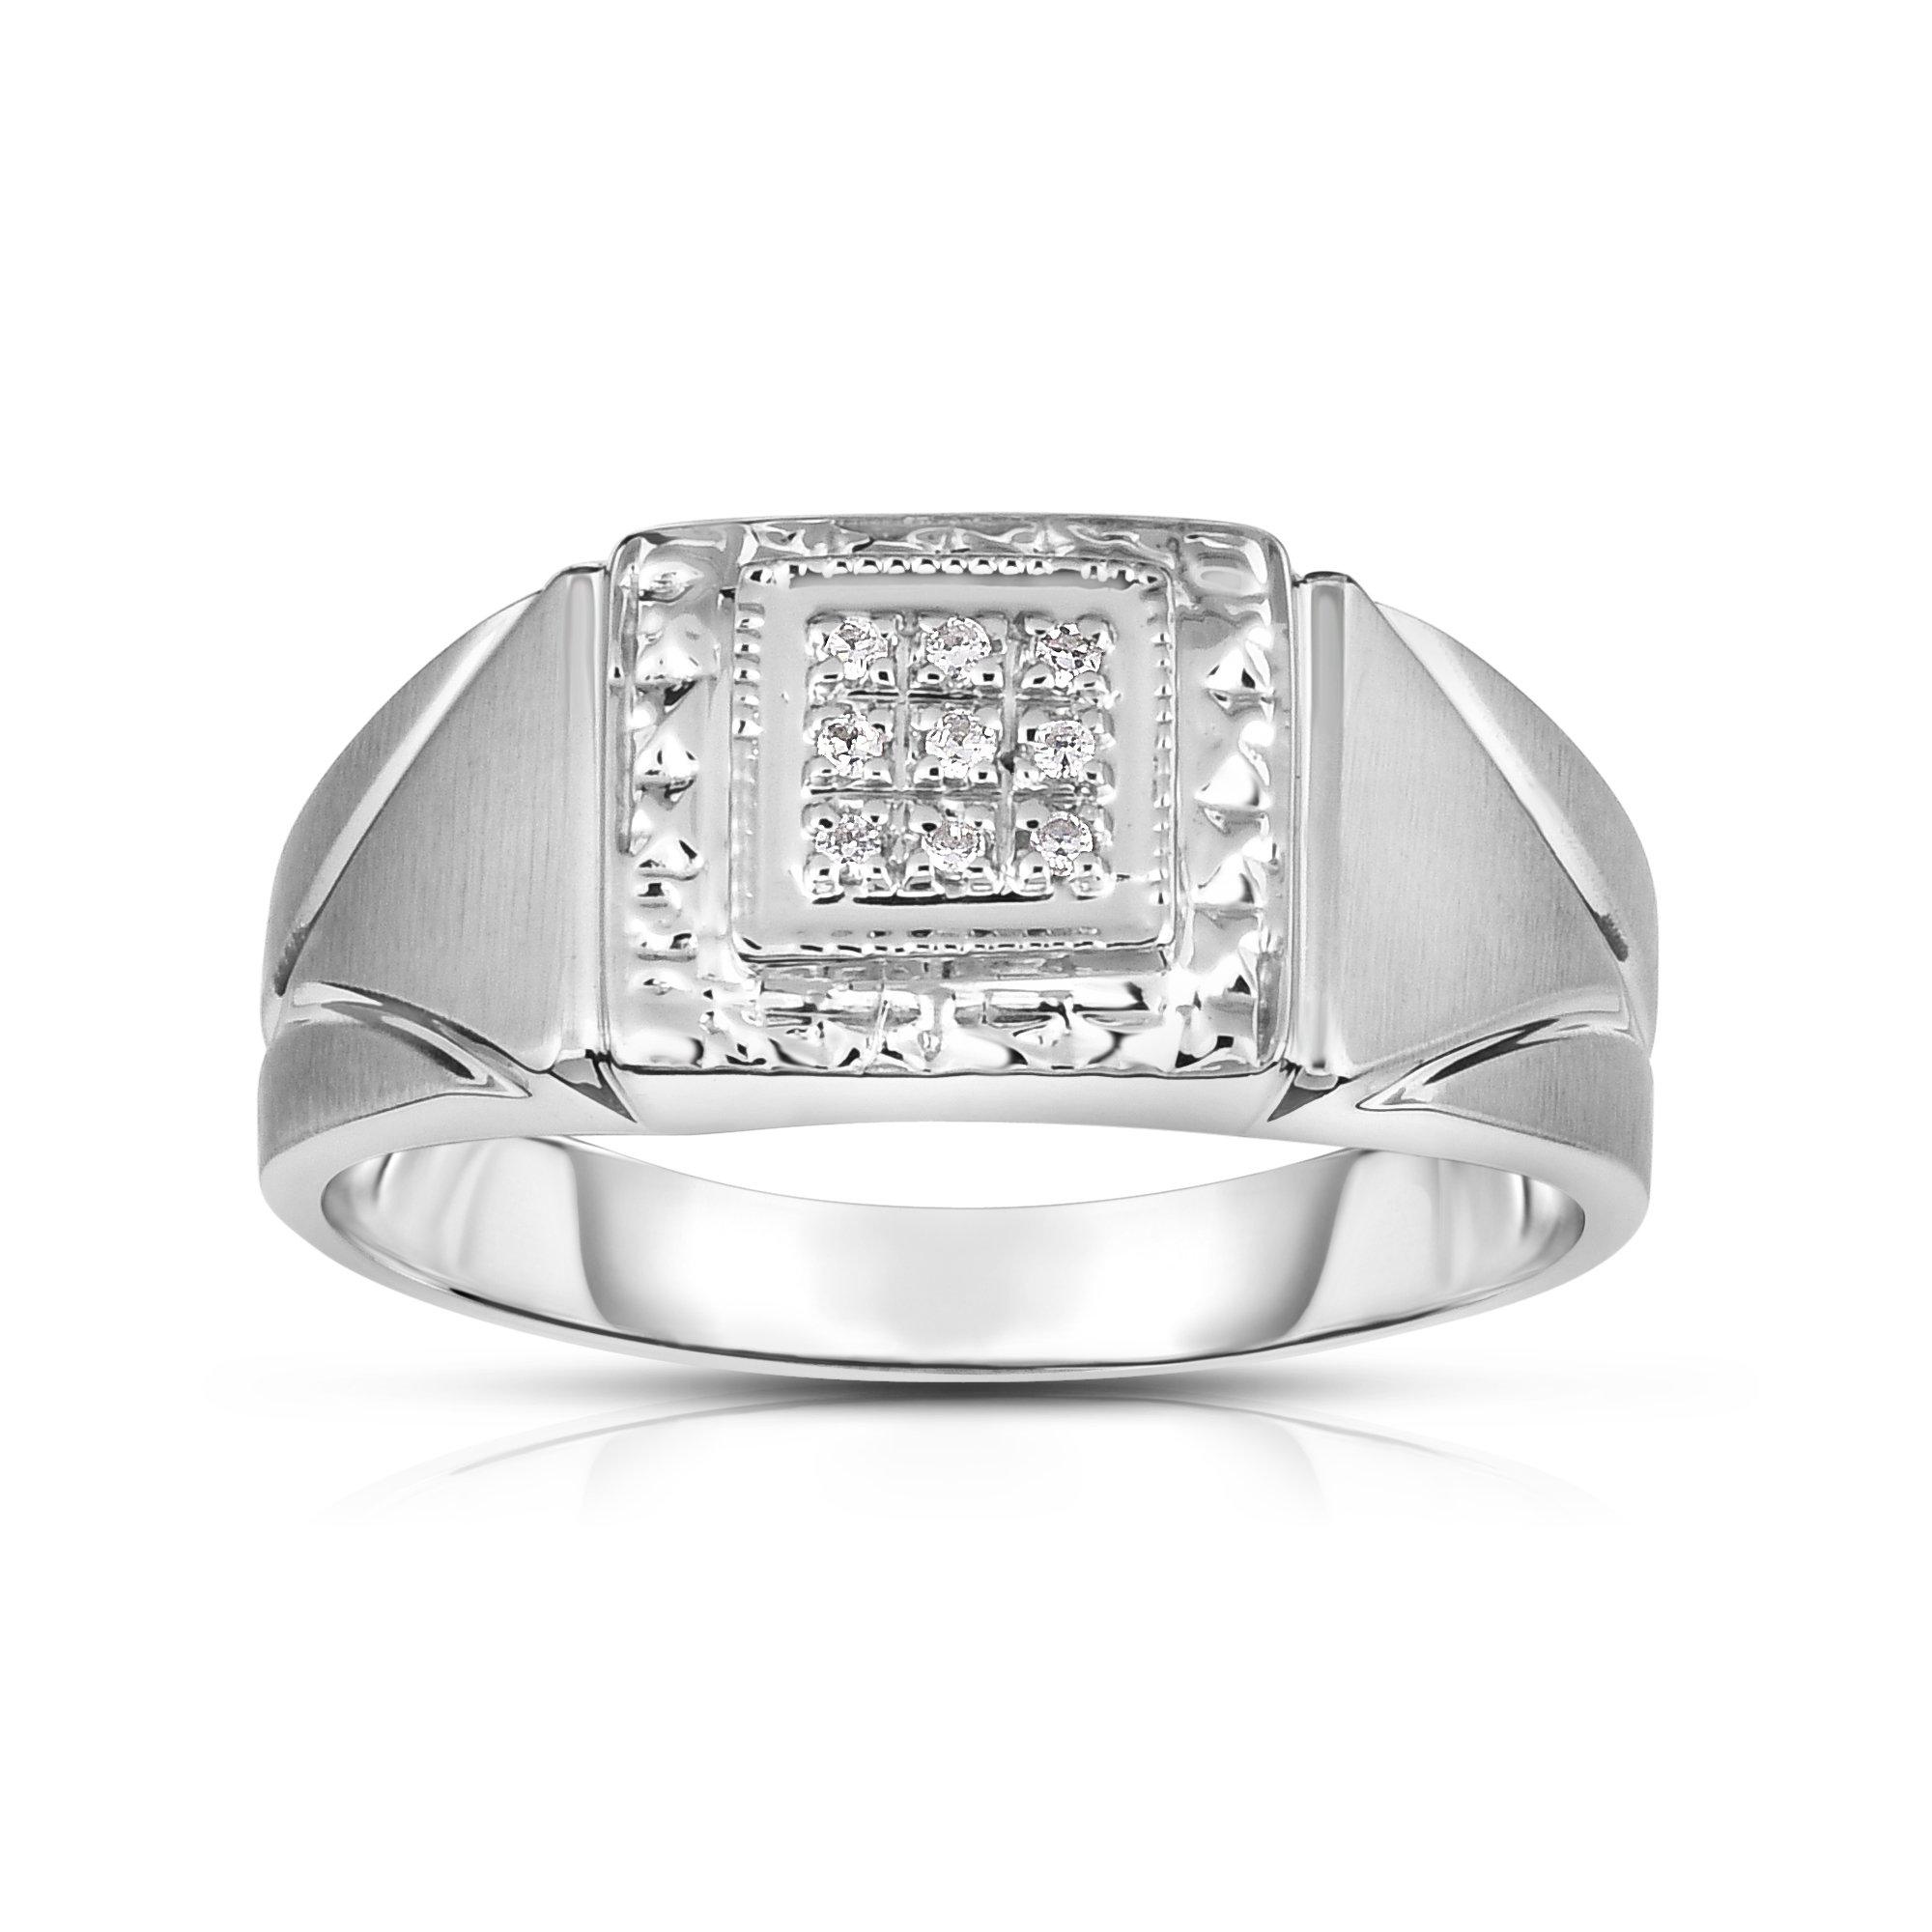 Noray Designs 14K White Gold Diamond (0.05 Ct, I1-I2 Clarity, G-H Color) Men's 9-Stone Ring